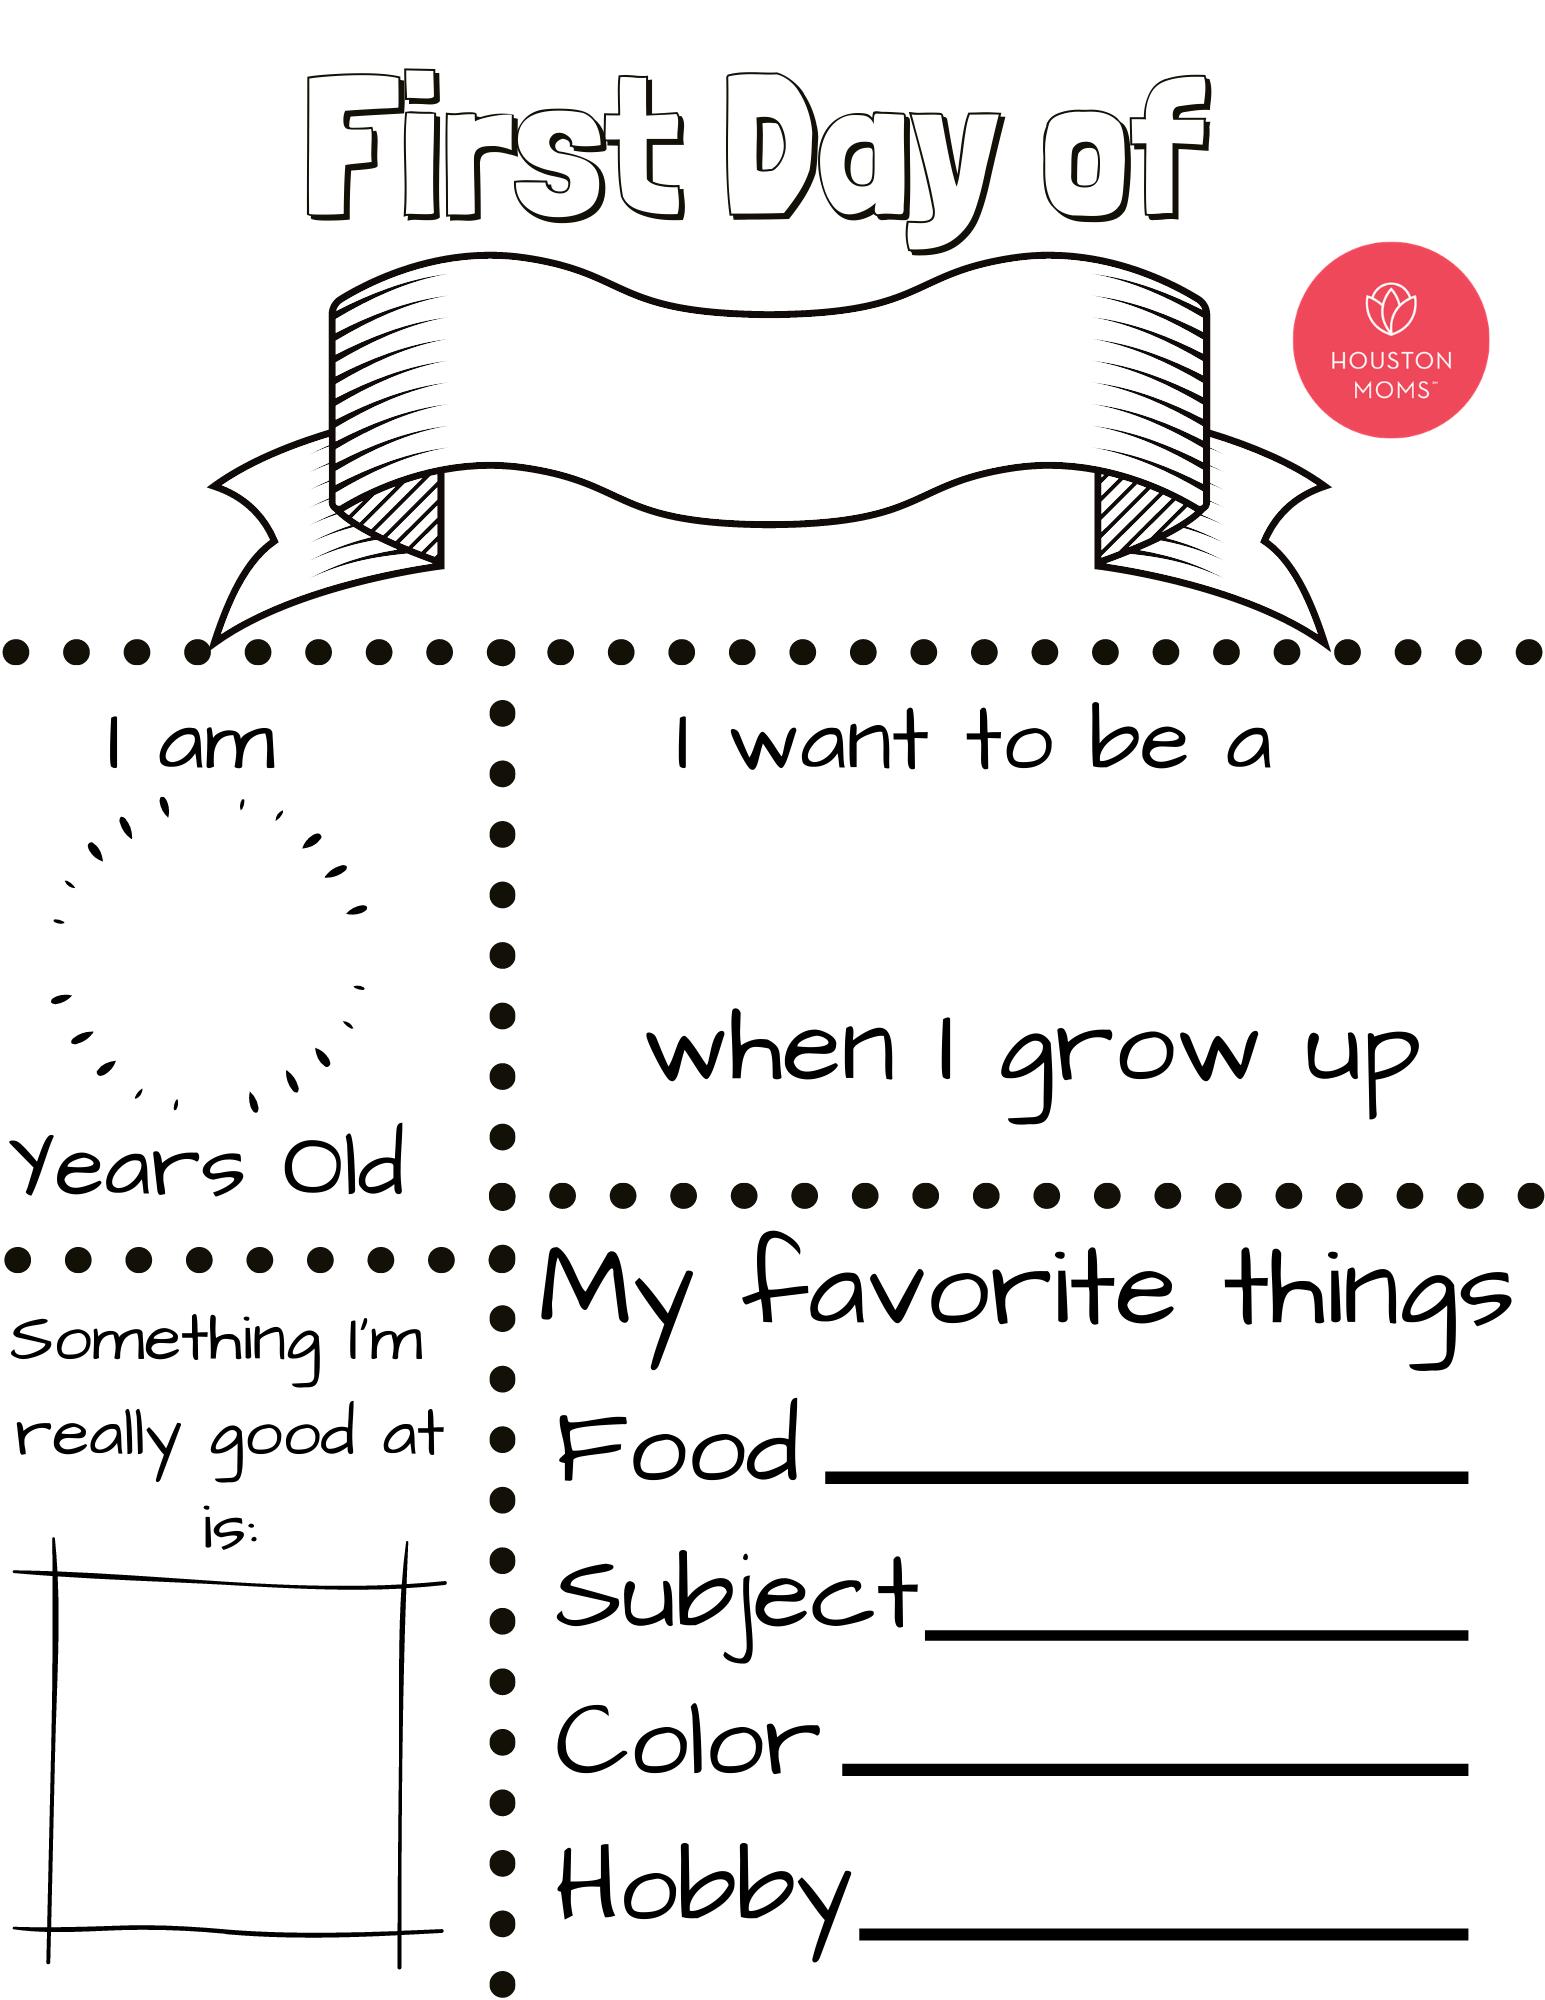 "Houston Mom ""First Day of School Sign"" #houstonmoms #houstonmomsblog #momsaroundhouston"